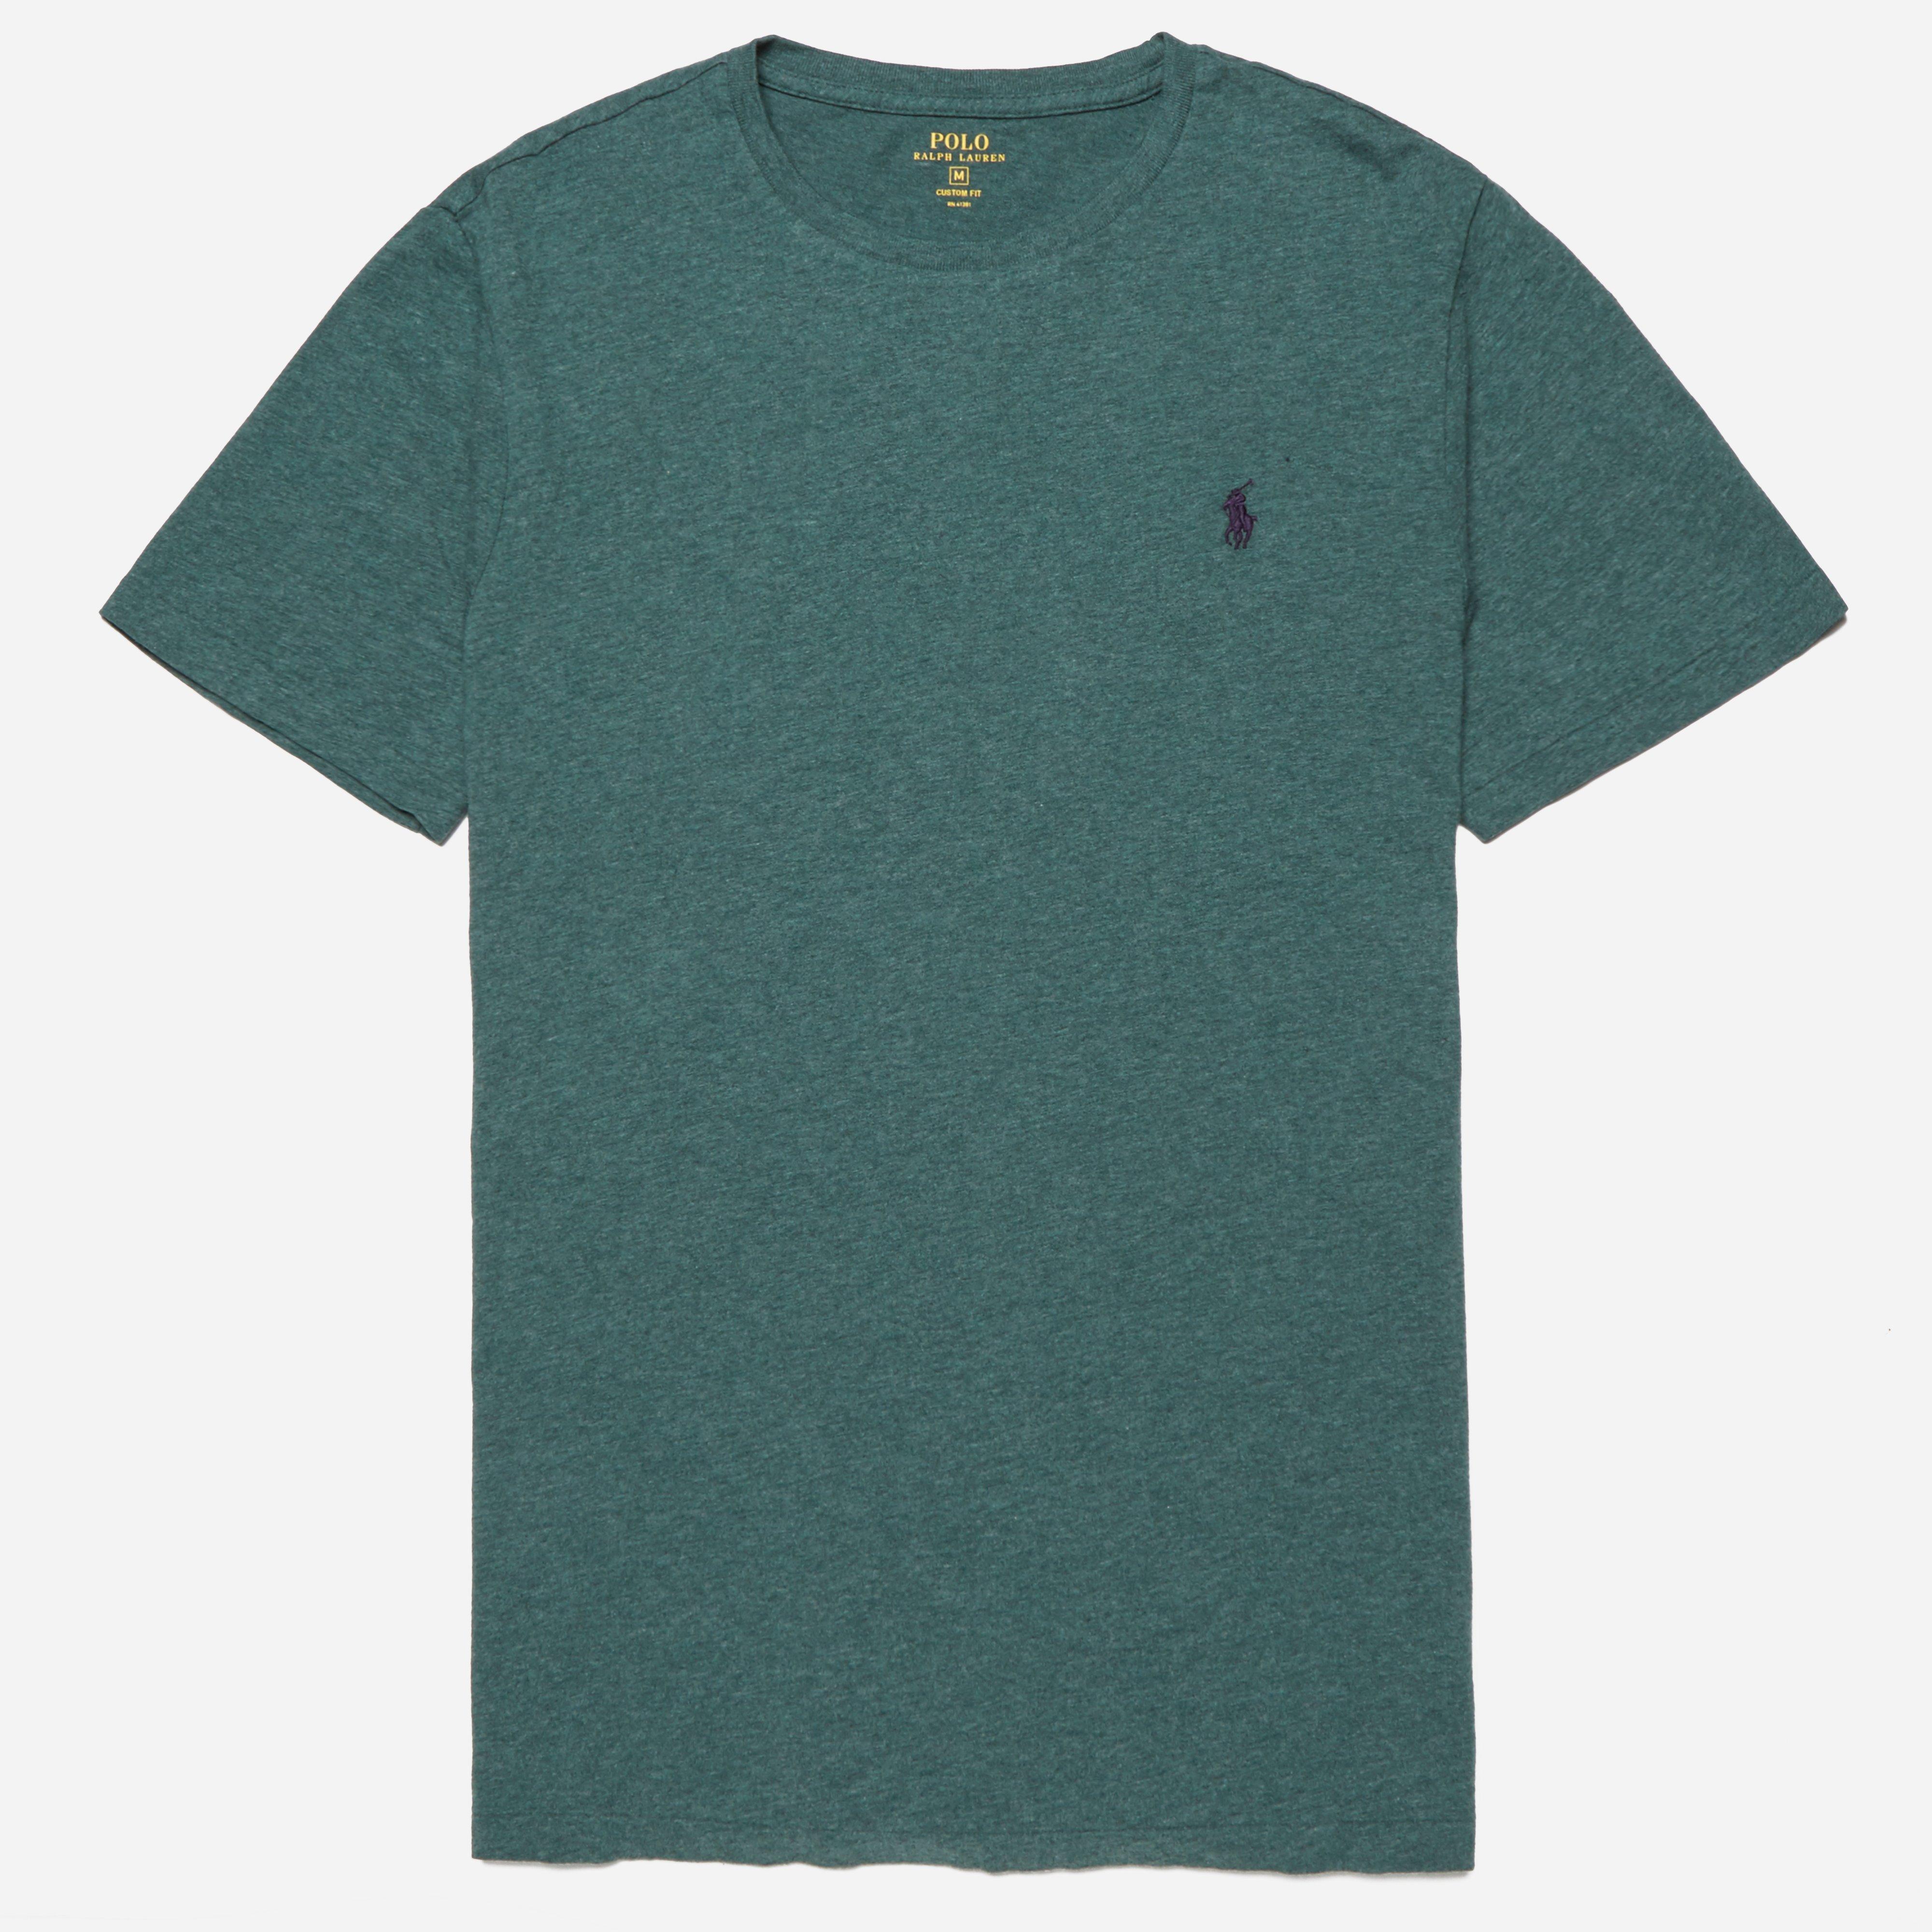 Polo Ralph Lauren Custom Fit Crew Neck T-shirt